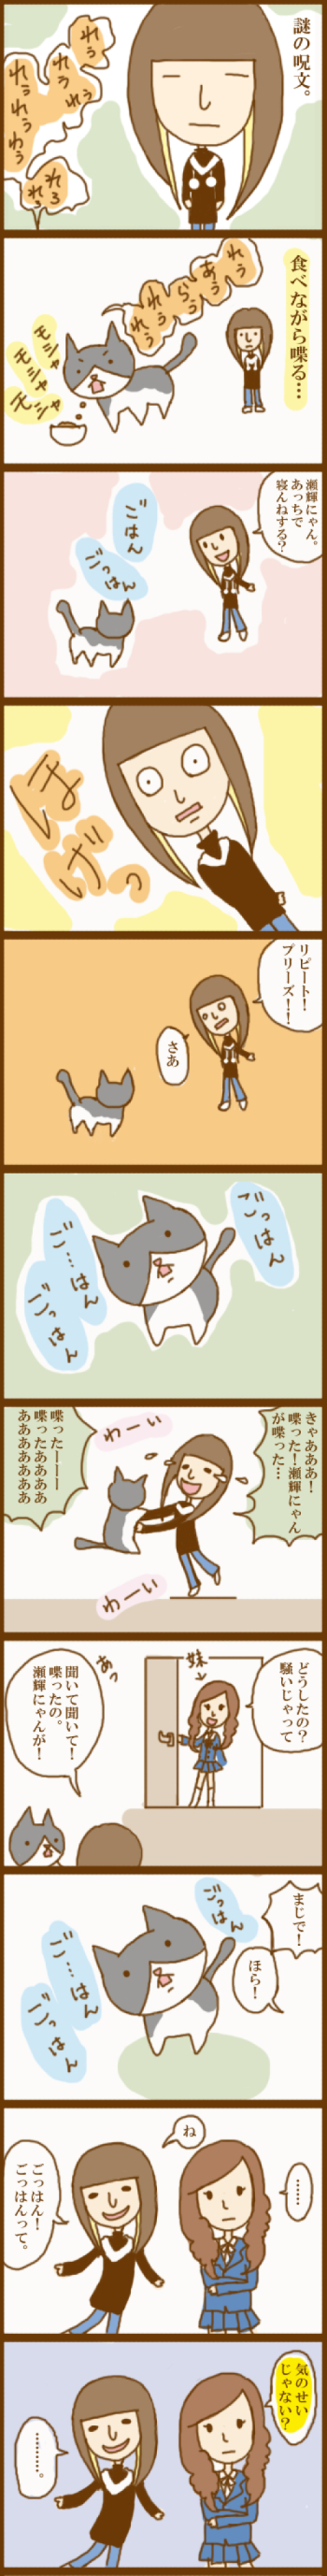 f:id:suzuokayu:20201011200202j:plain